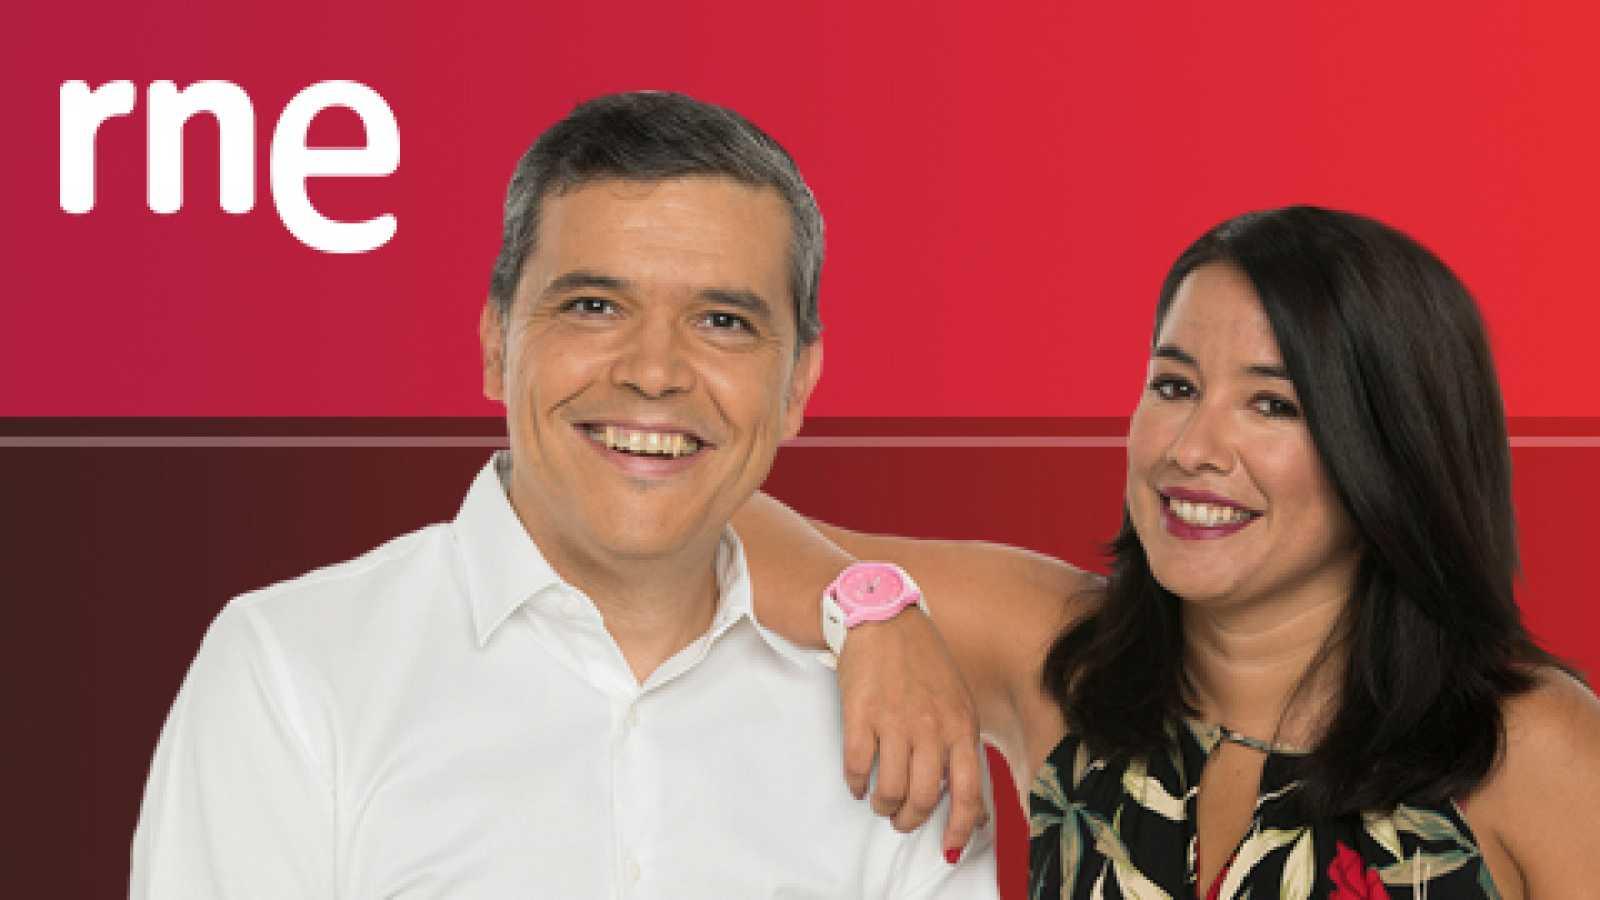 Las mañanas de RNE con Alfredo Menéndez - Segunda hora - 28/08/19 - escuchar ahora